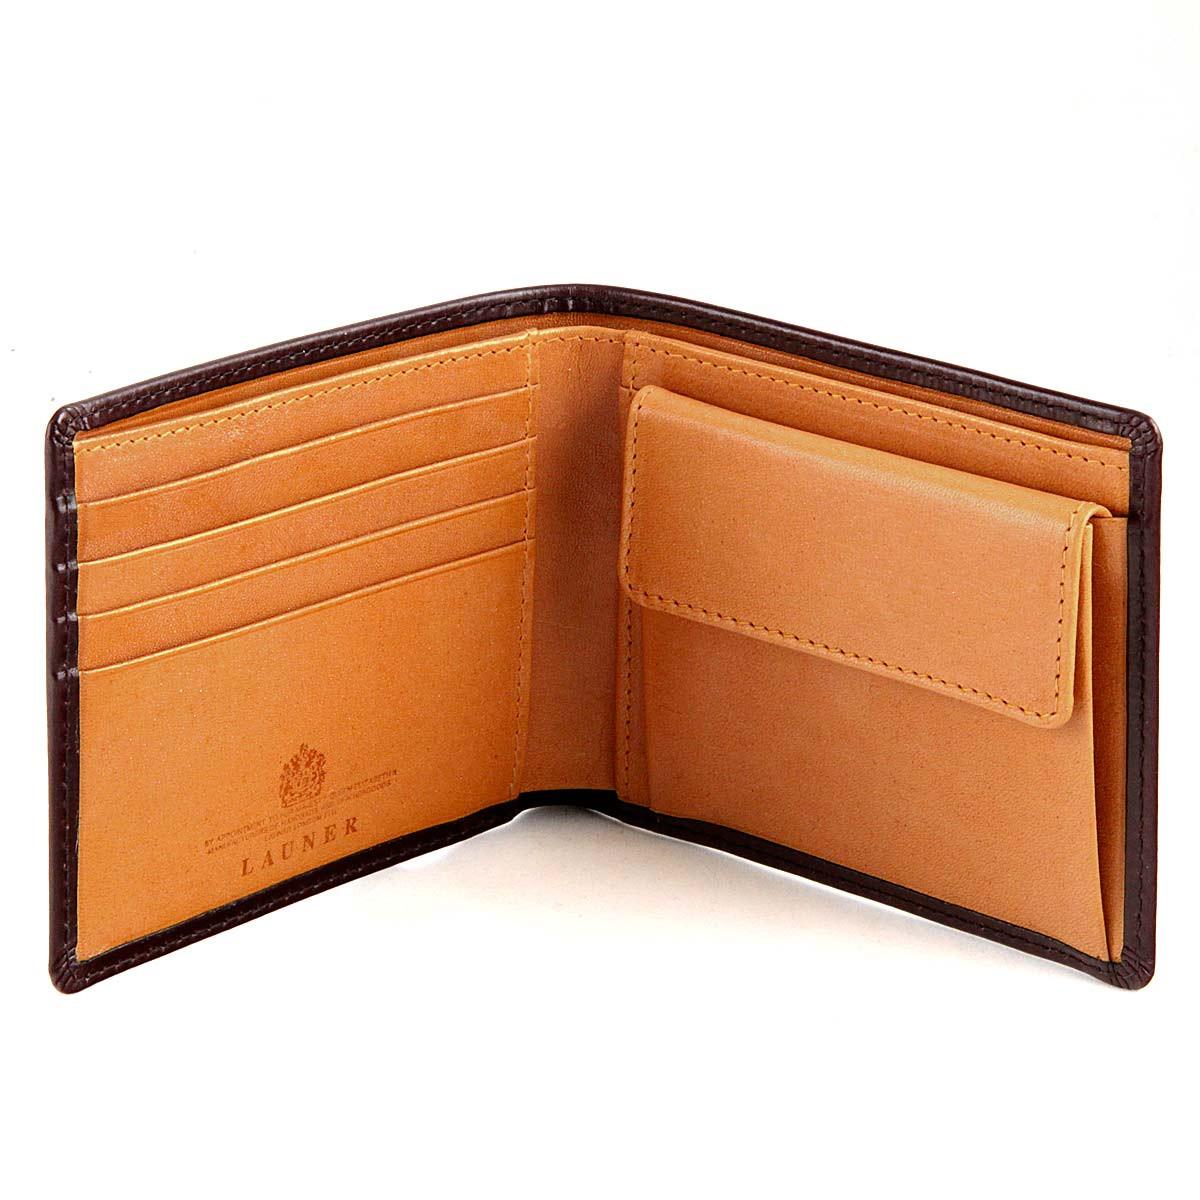 Launer Bridle Hide Wallet 717 Brown Tan  ee173bc33a9a